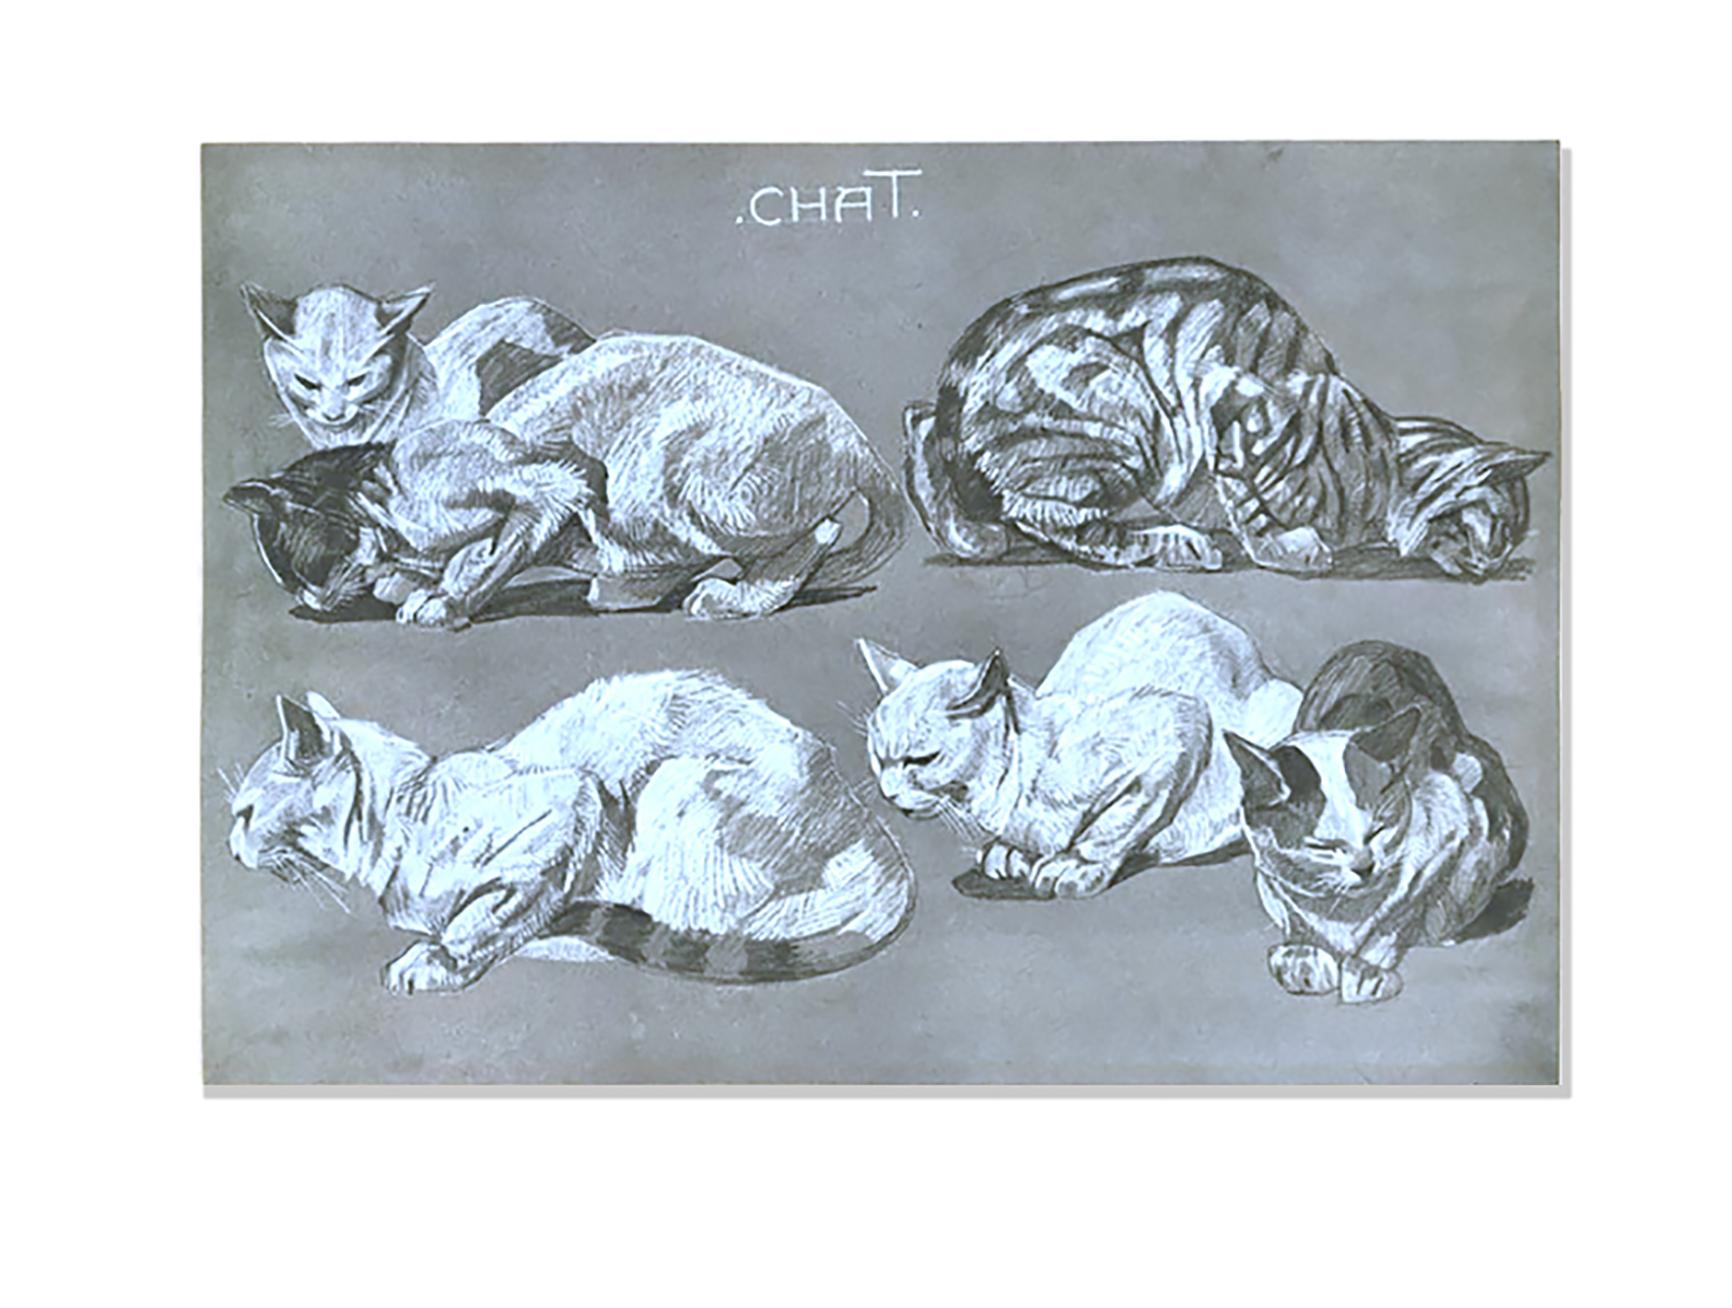 Chat -Études d'animaux, de Méheut, Mathurin, 1882-1958 (Artist) - The Digital Public Library of America-NYPL catalog ID (B-number): b13983745